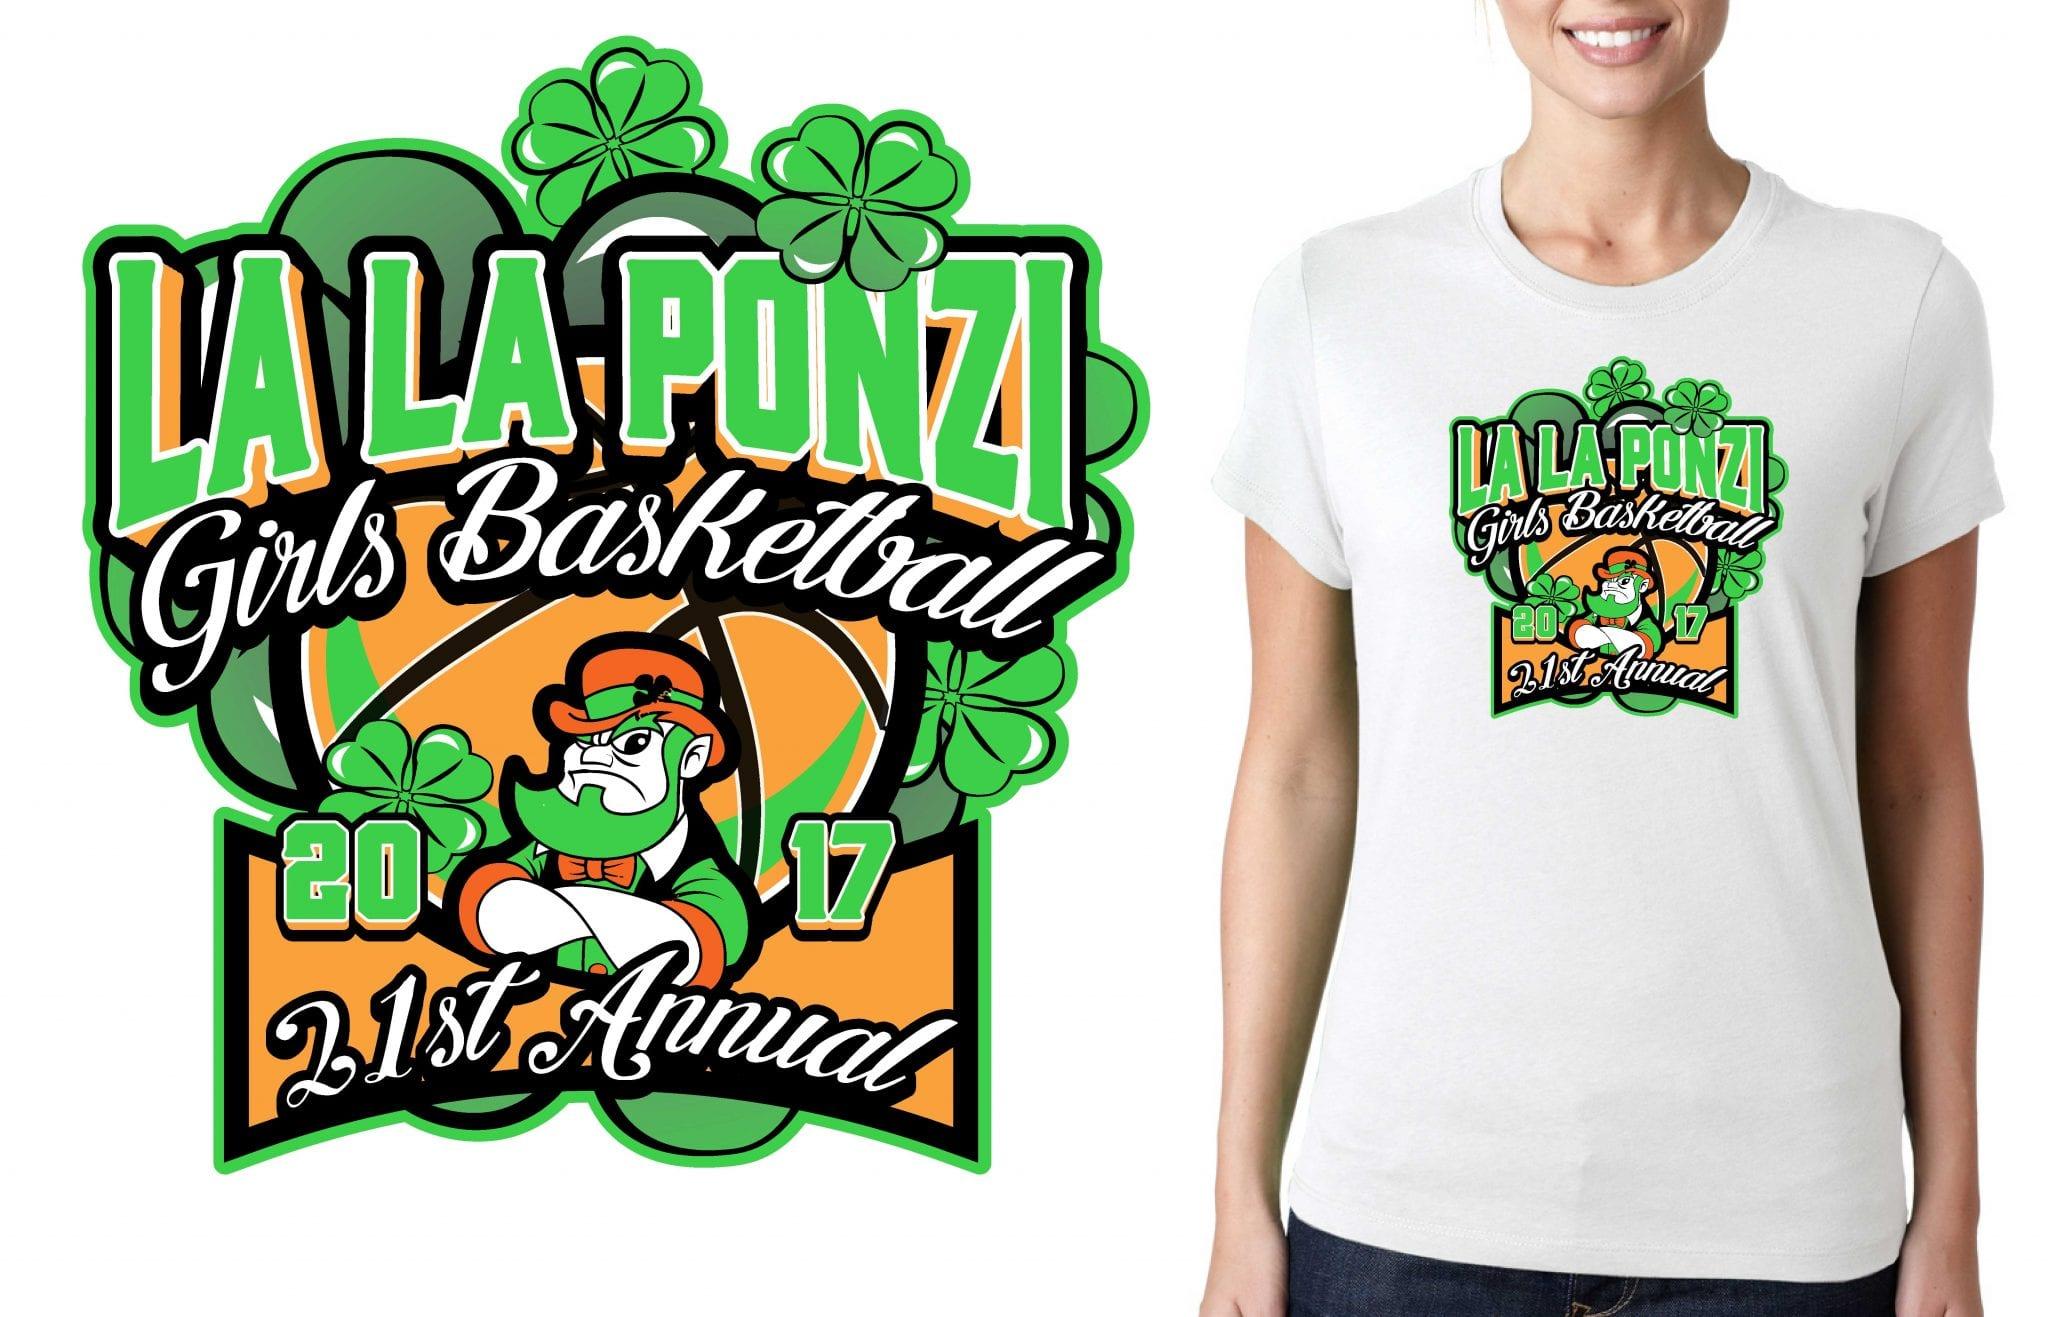 BASKETBALL TSHIRT LOGO for 2017-21st-Annual-La-La-Ponzi-Tournament BY UrArtStudio